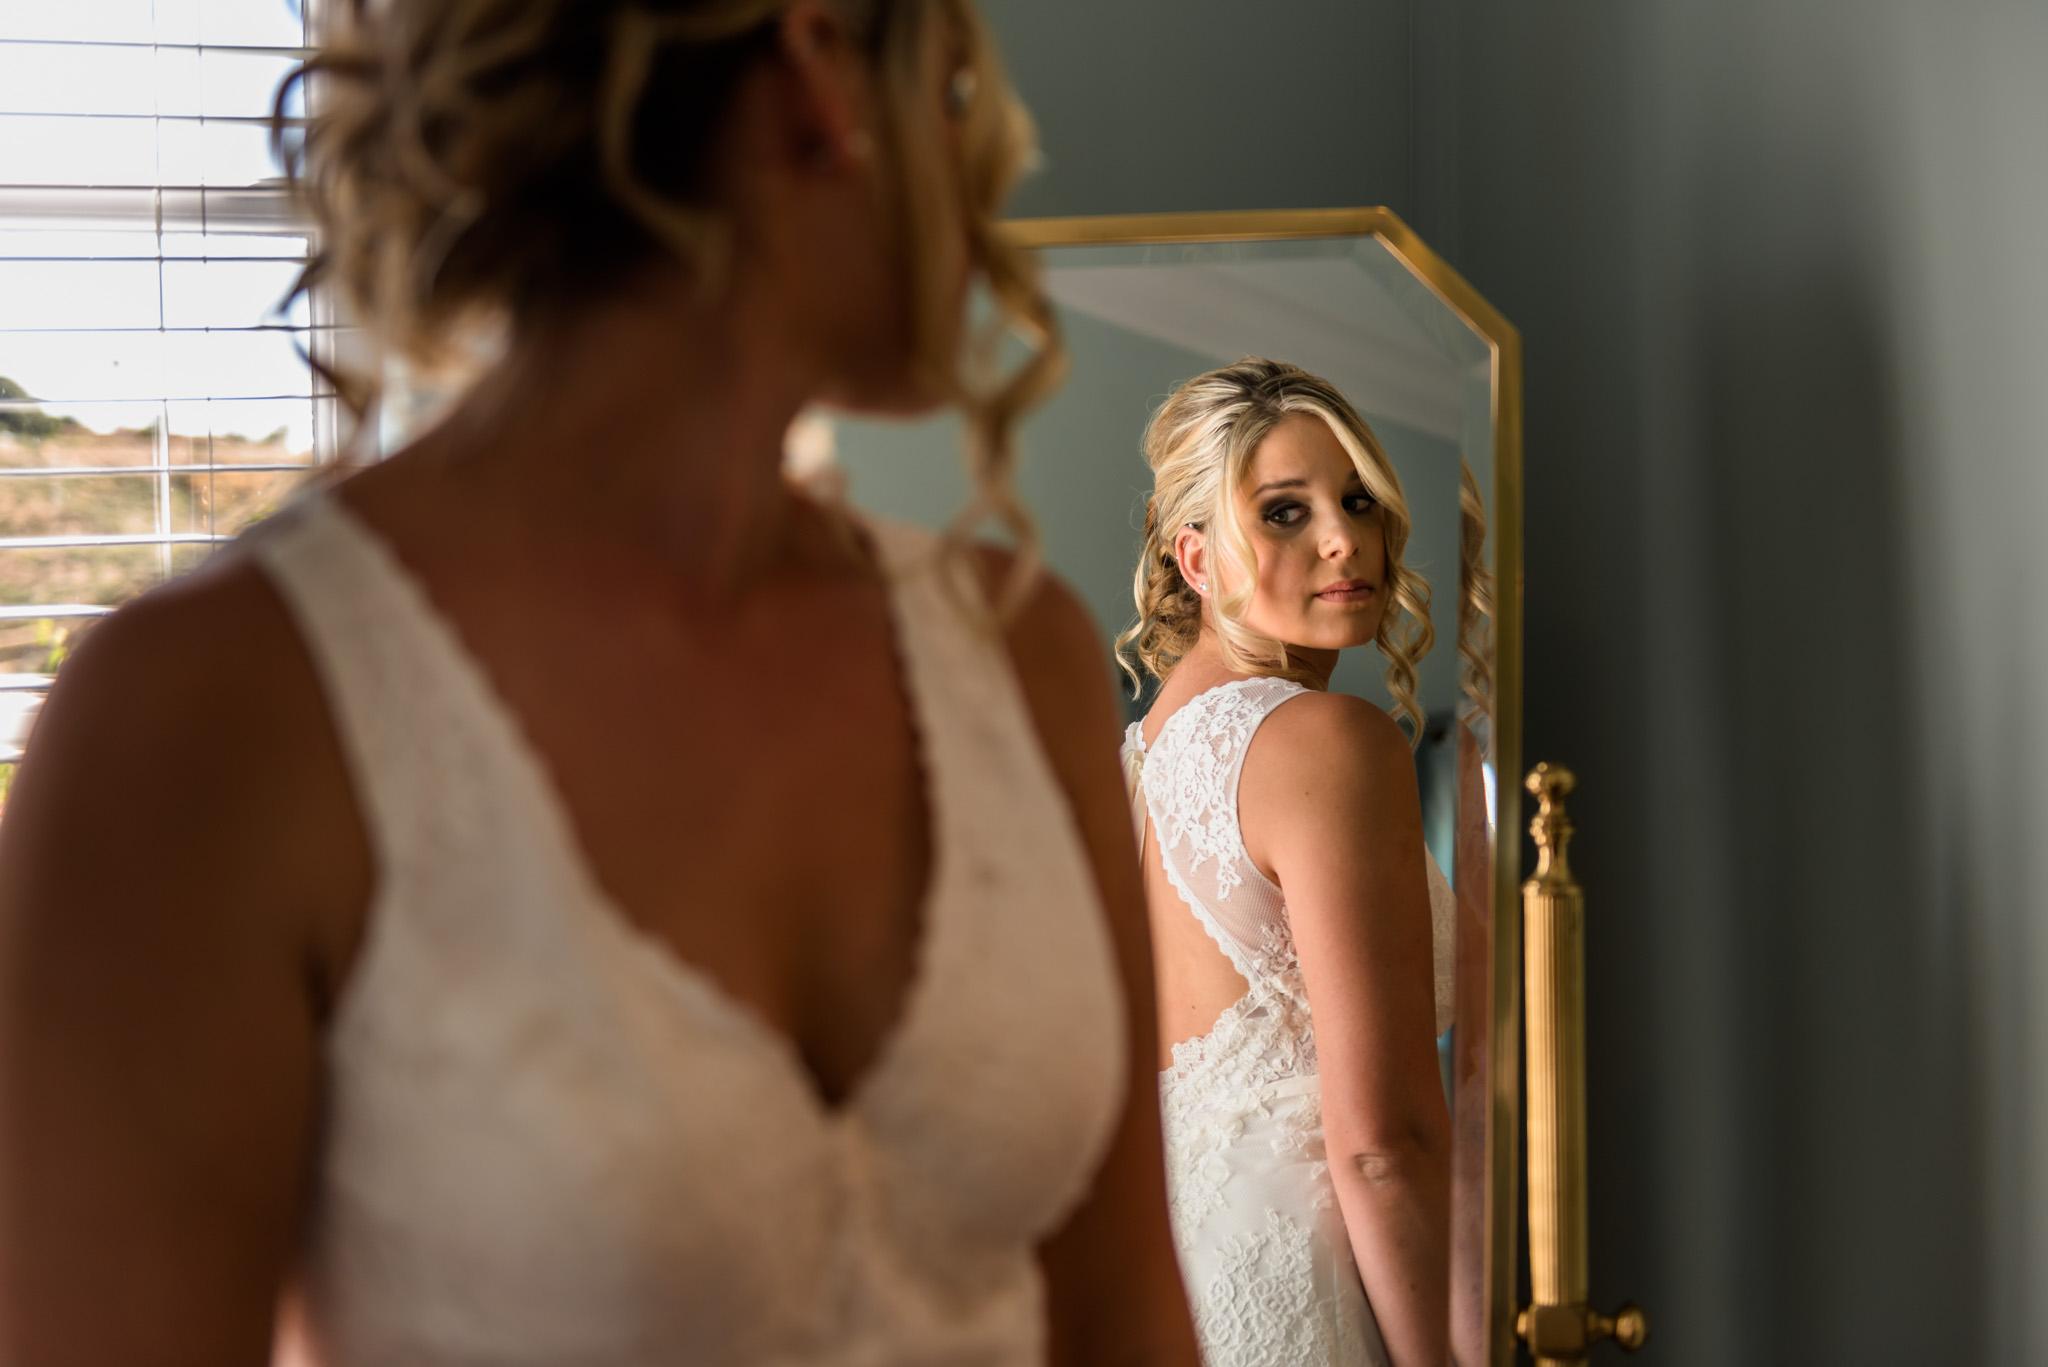 Avensole-Winery-Temecula-Wedding-Josh-and-Olivia-3089.JPG